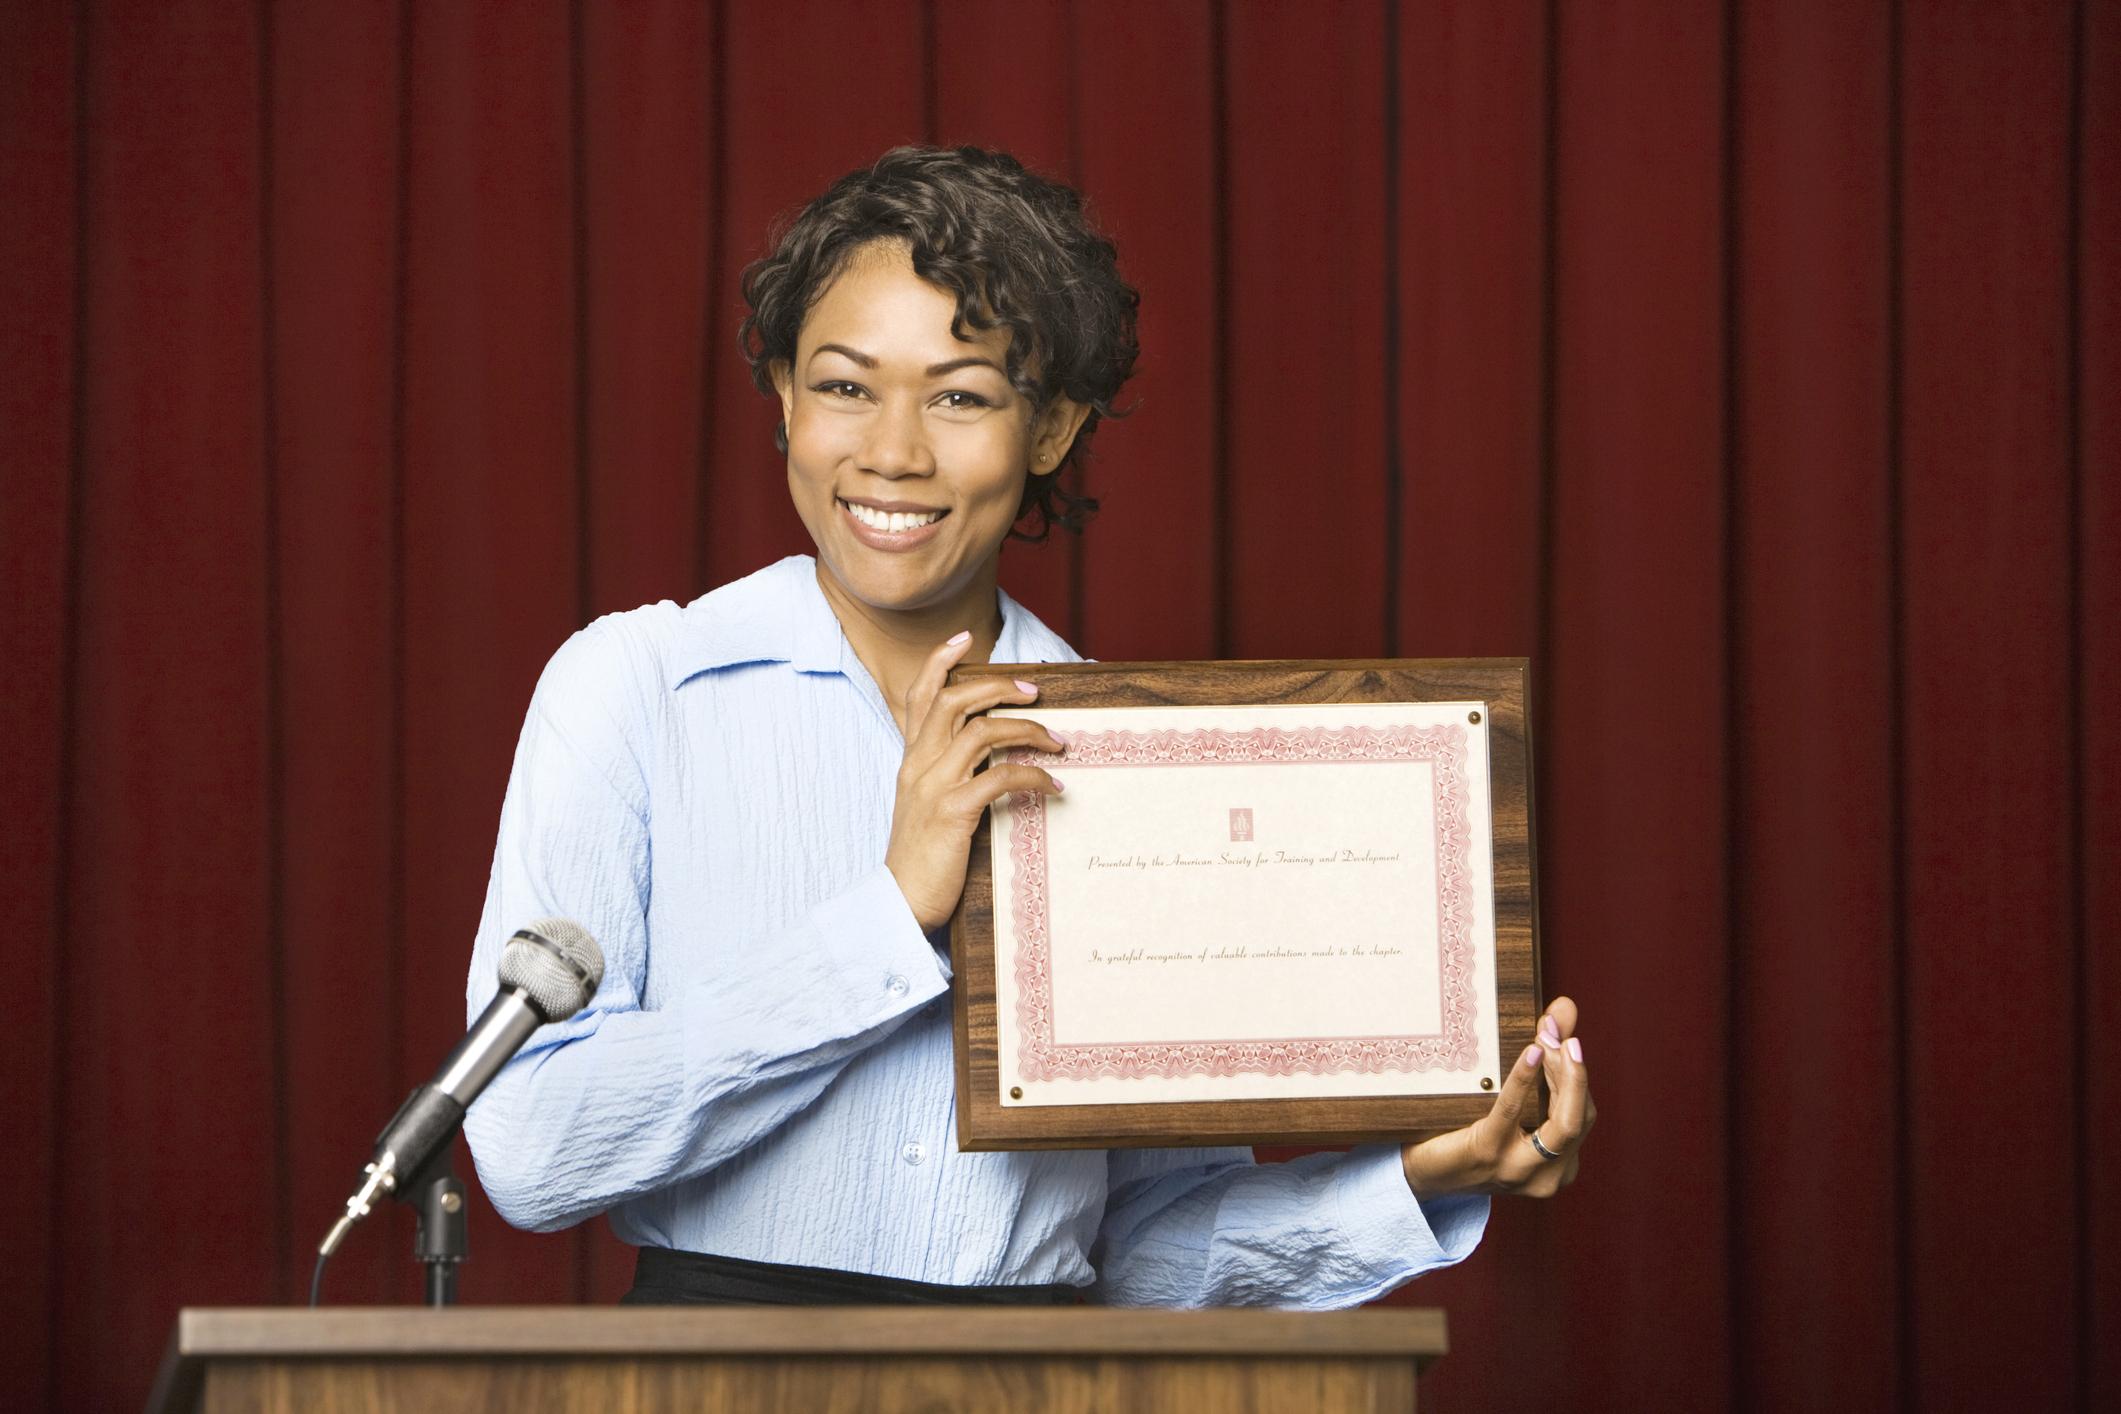 Free Sample Award Certificates  LoveToKnow In Life Saving Award Certificate Template